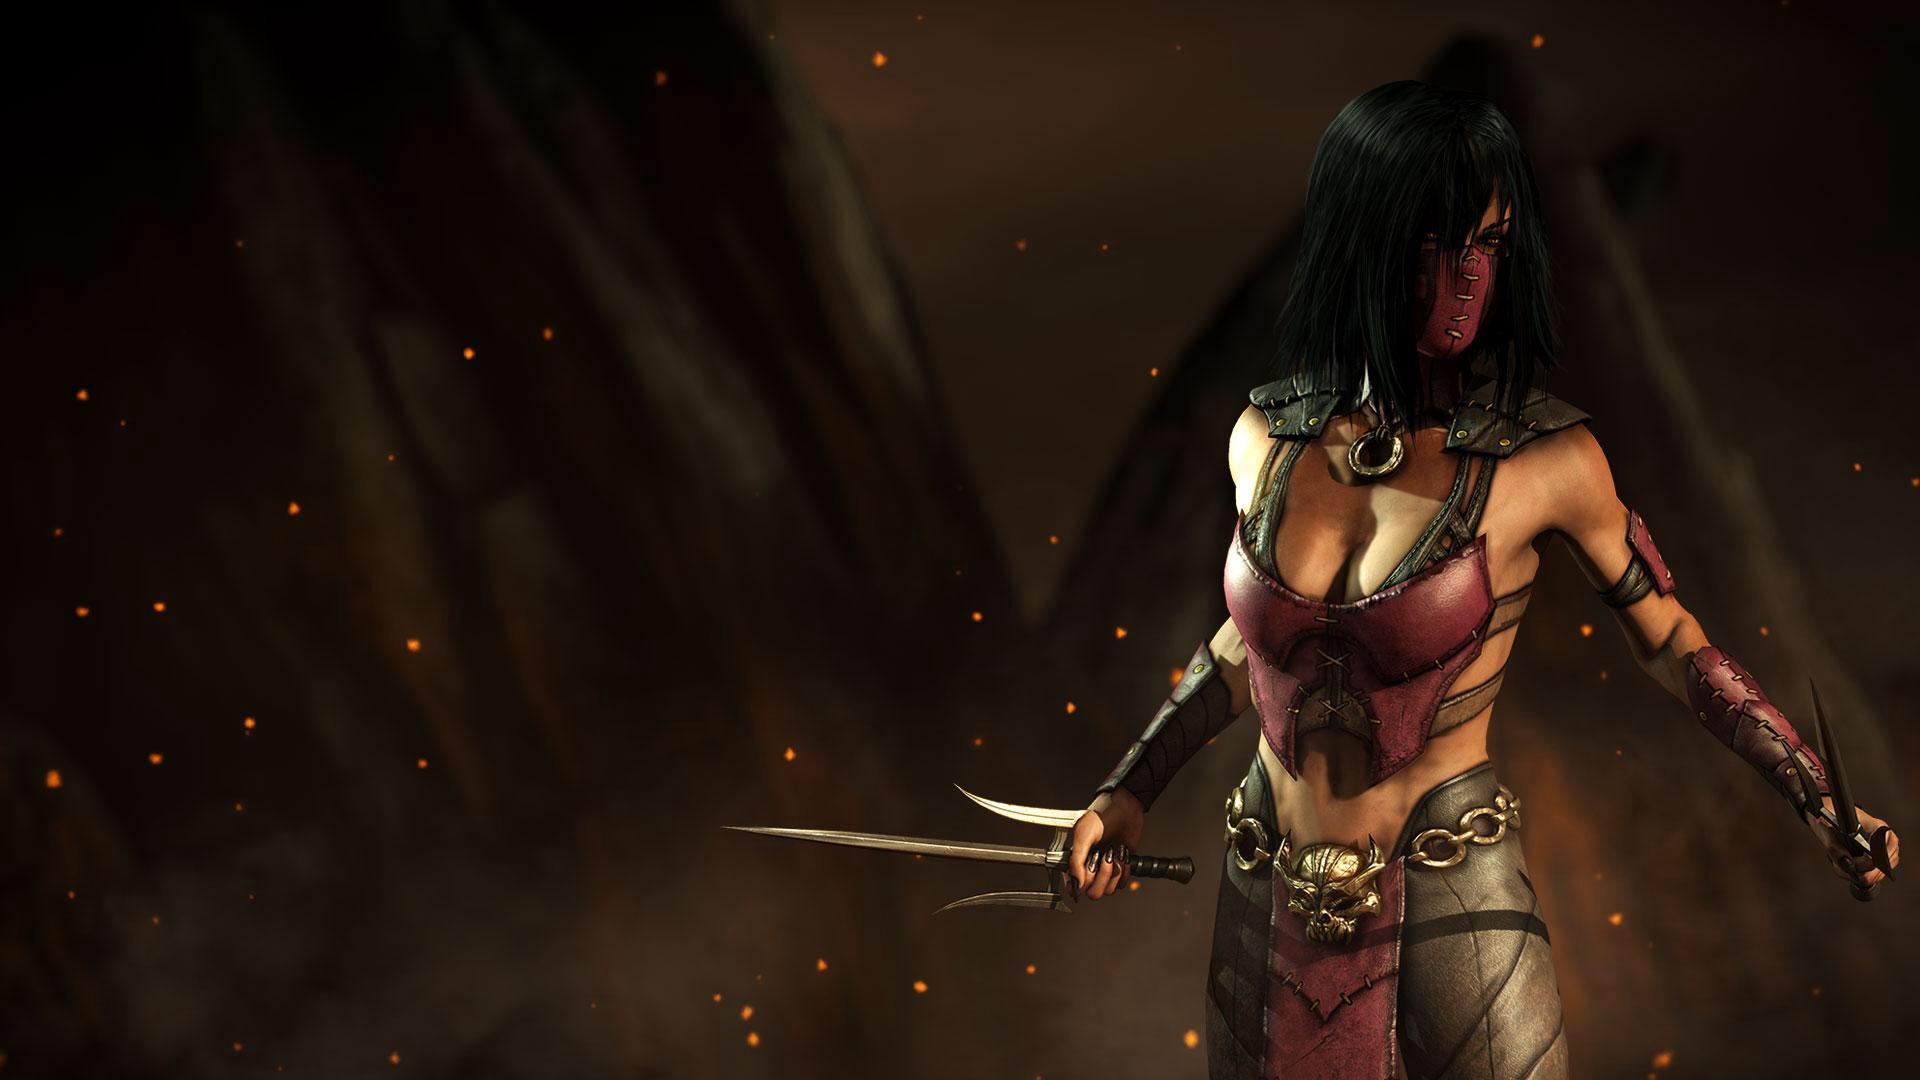 Mileena: Former Empress/Kahnum of Outworld